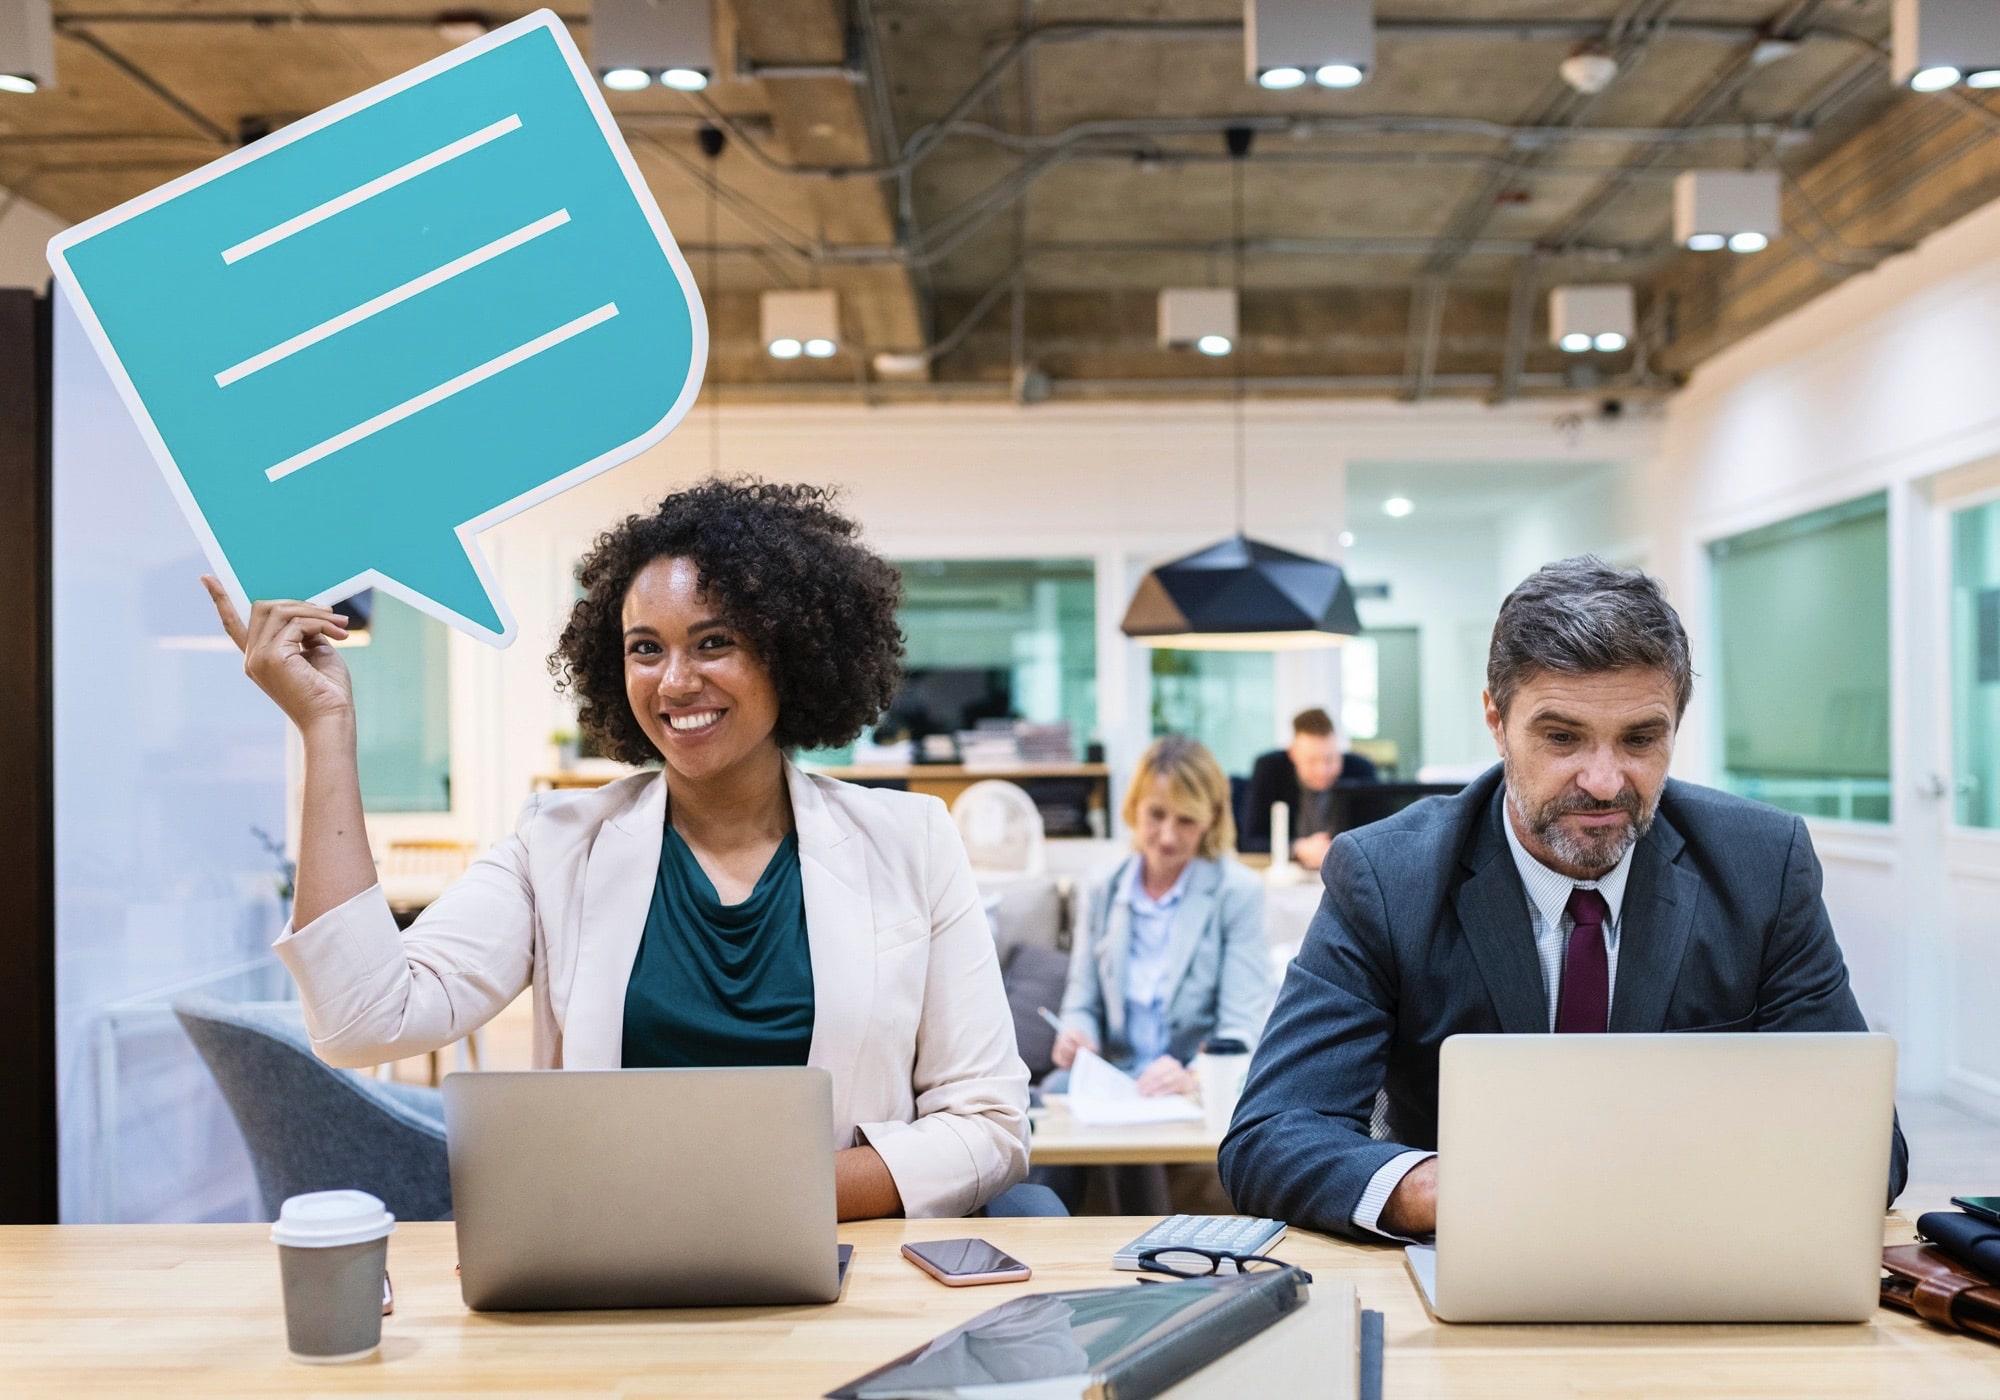 So kann Ihr Social Intranet Employee Engagement fördern